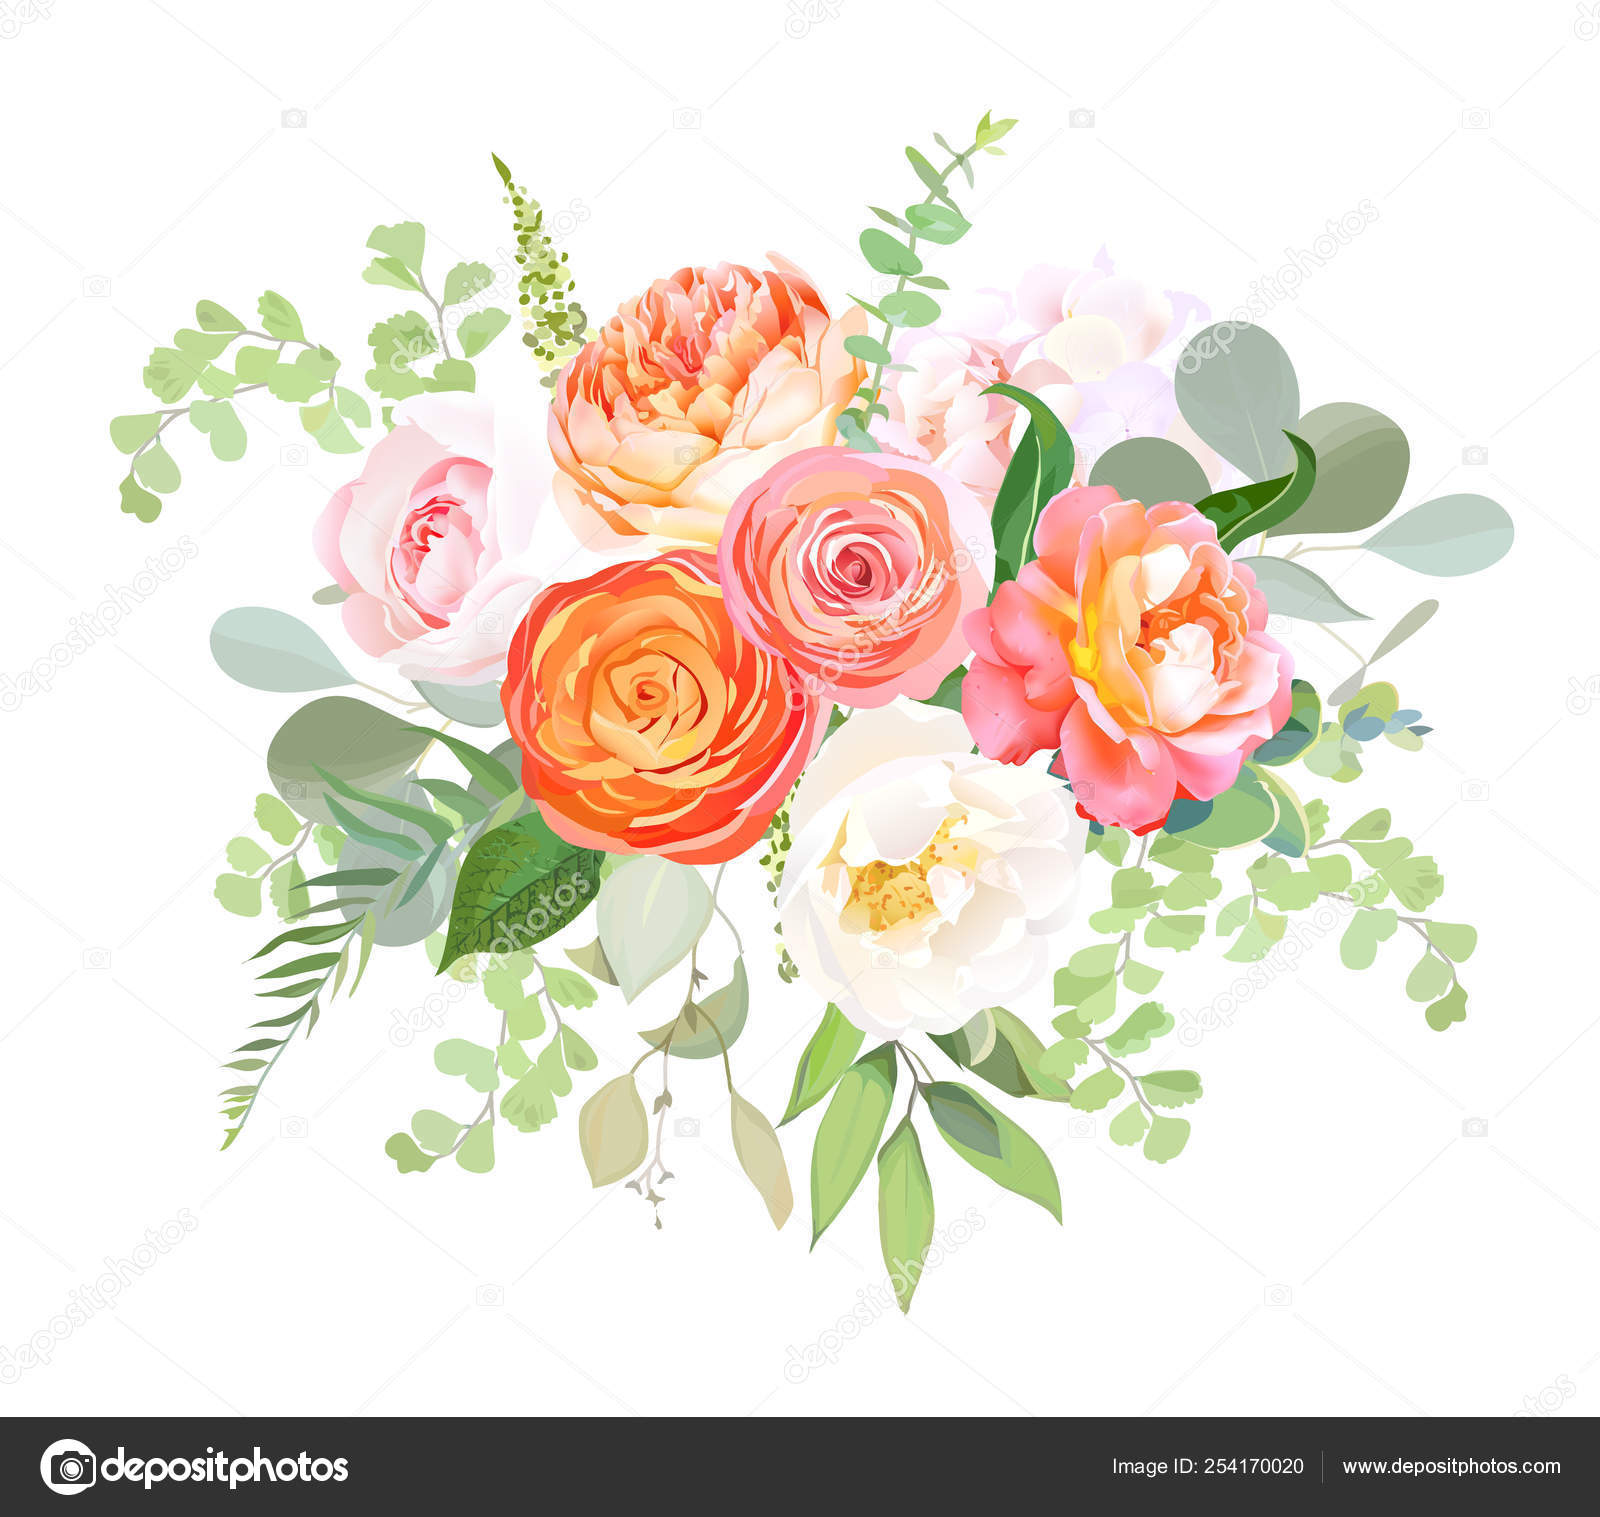 Orange Ranunculus Pink Rose White Hydrangea Juliet Rose Garden Flowers Vector Image By C Lavendertime Vector Stock 254170020